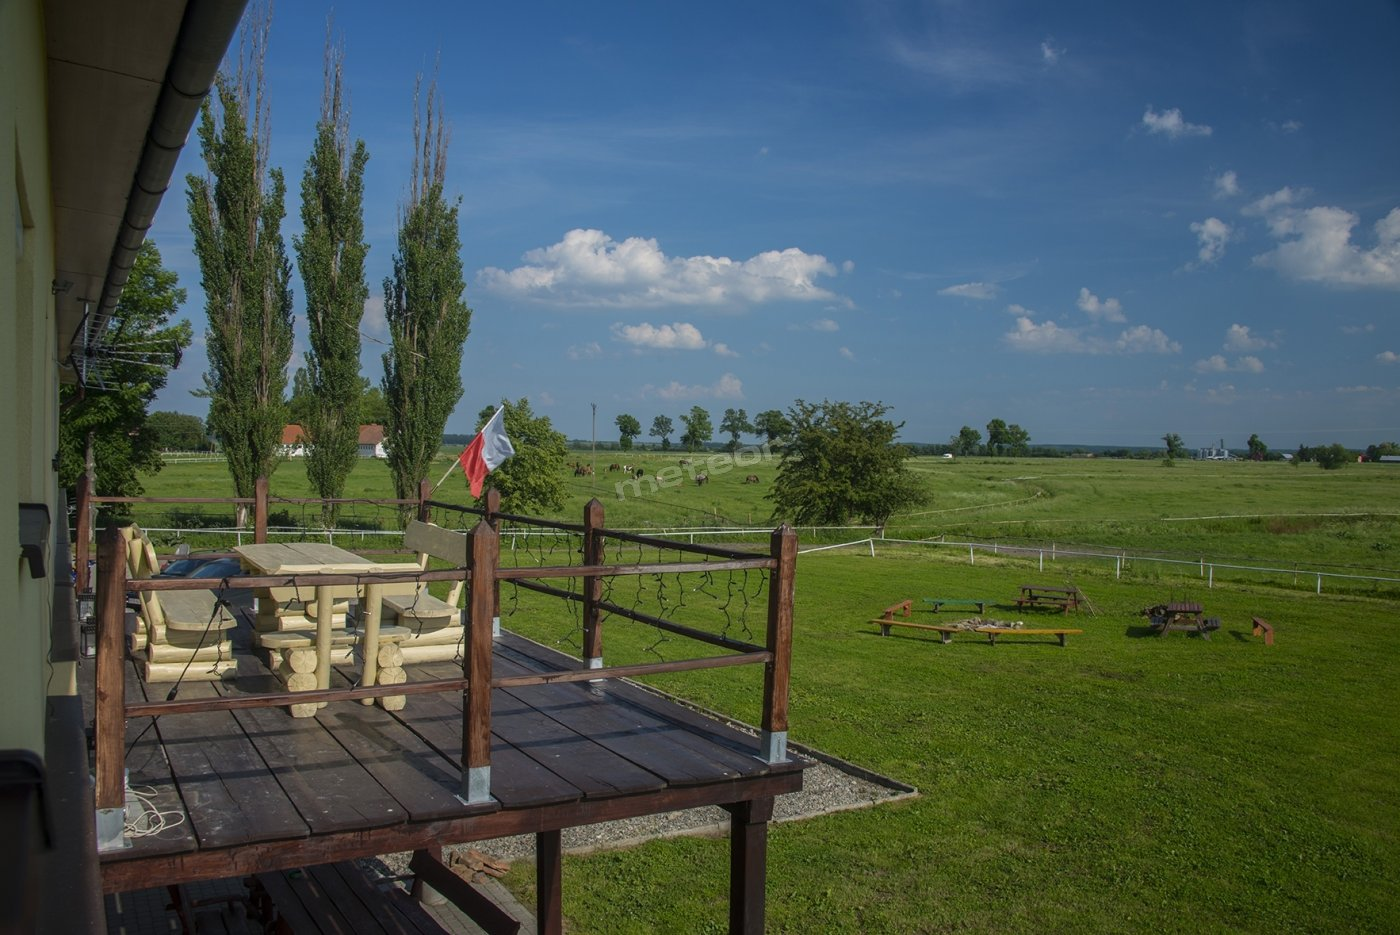 Stadnina Koni Stubno Ola i Michał Weresińscy